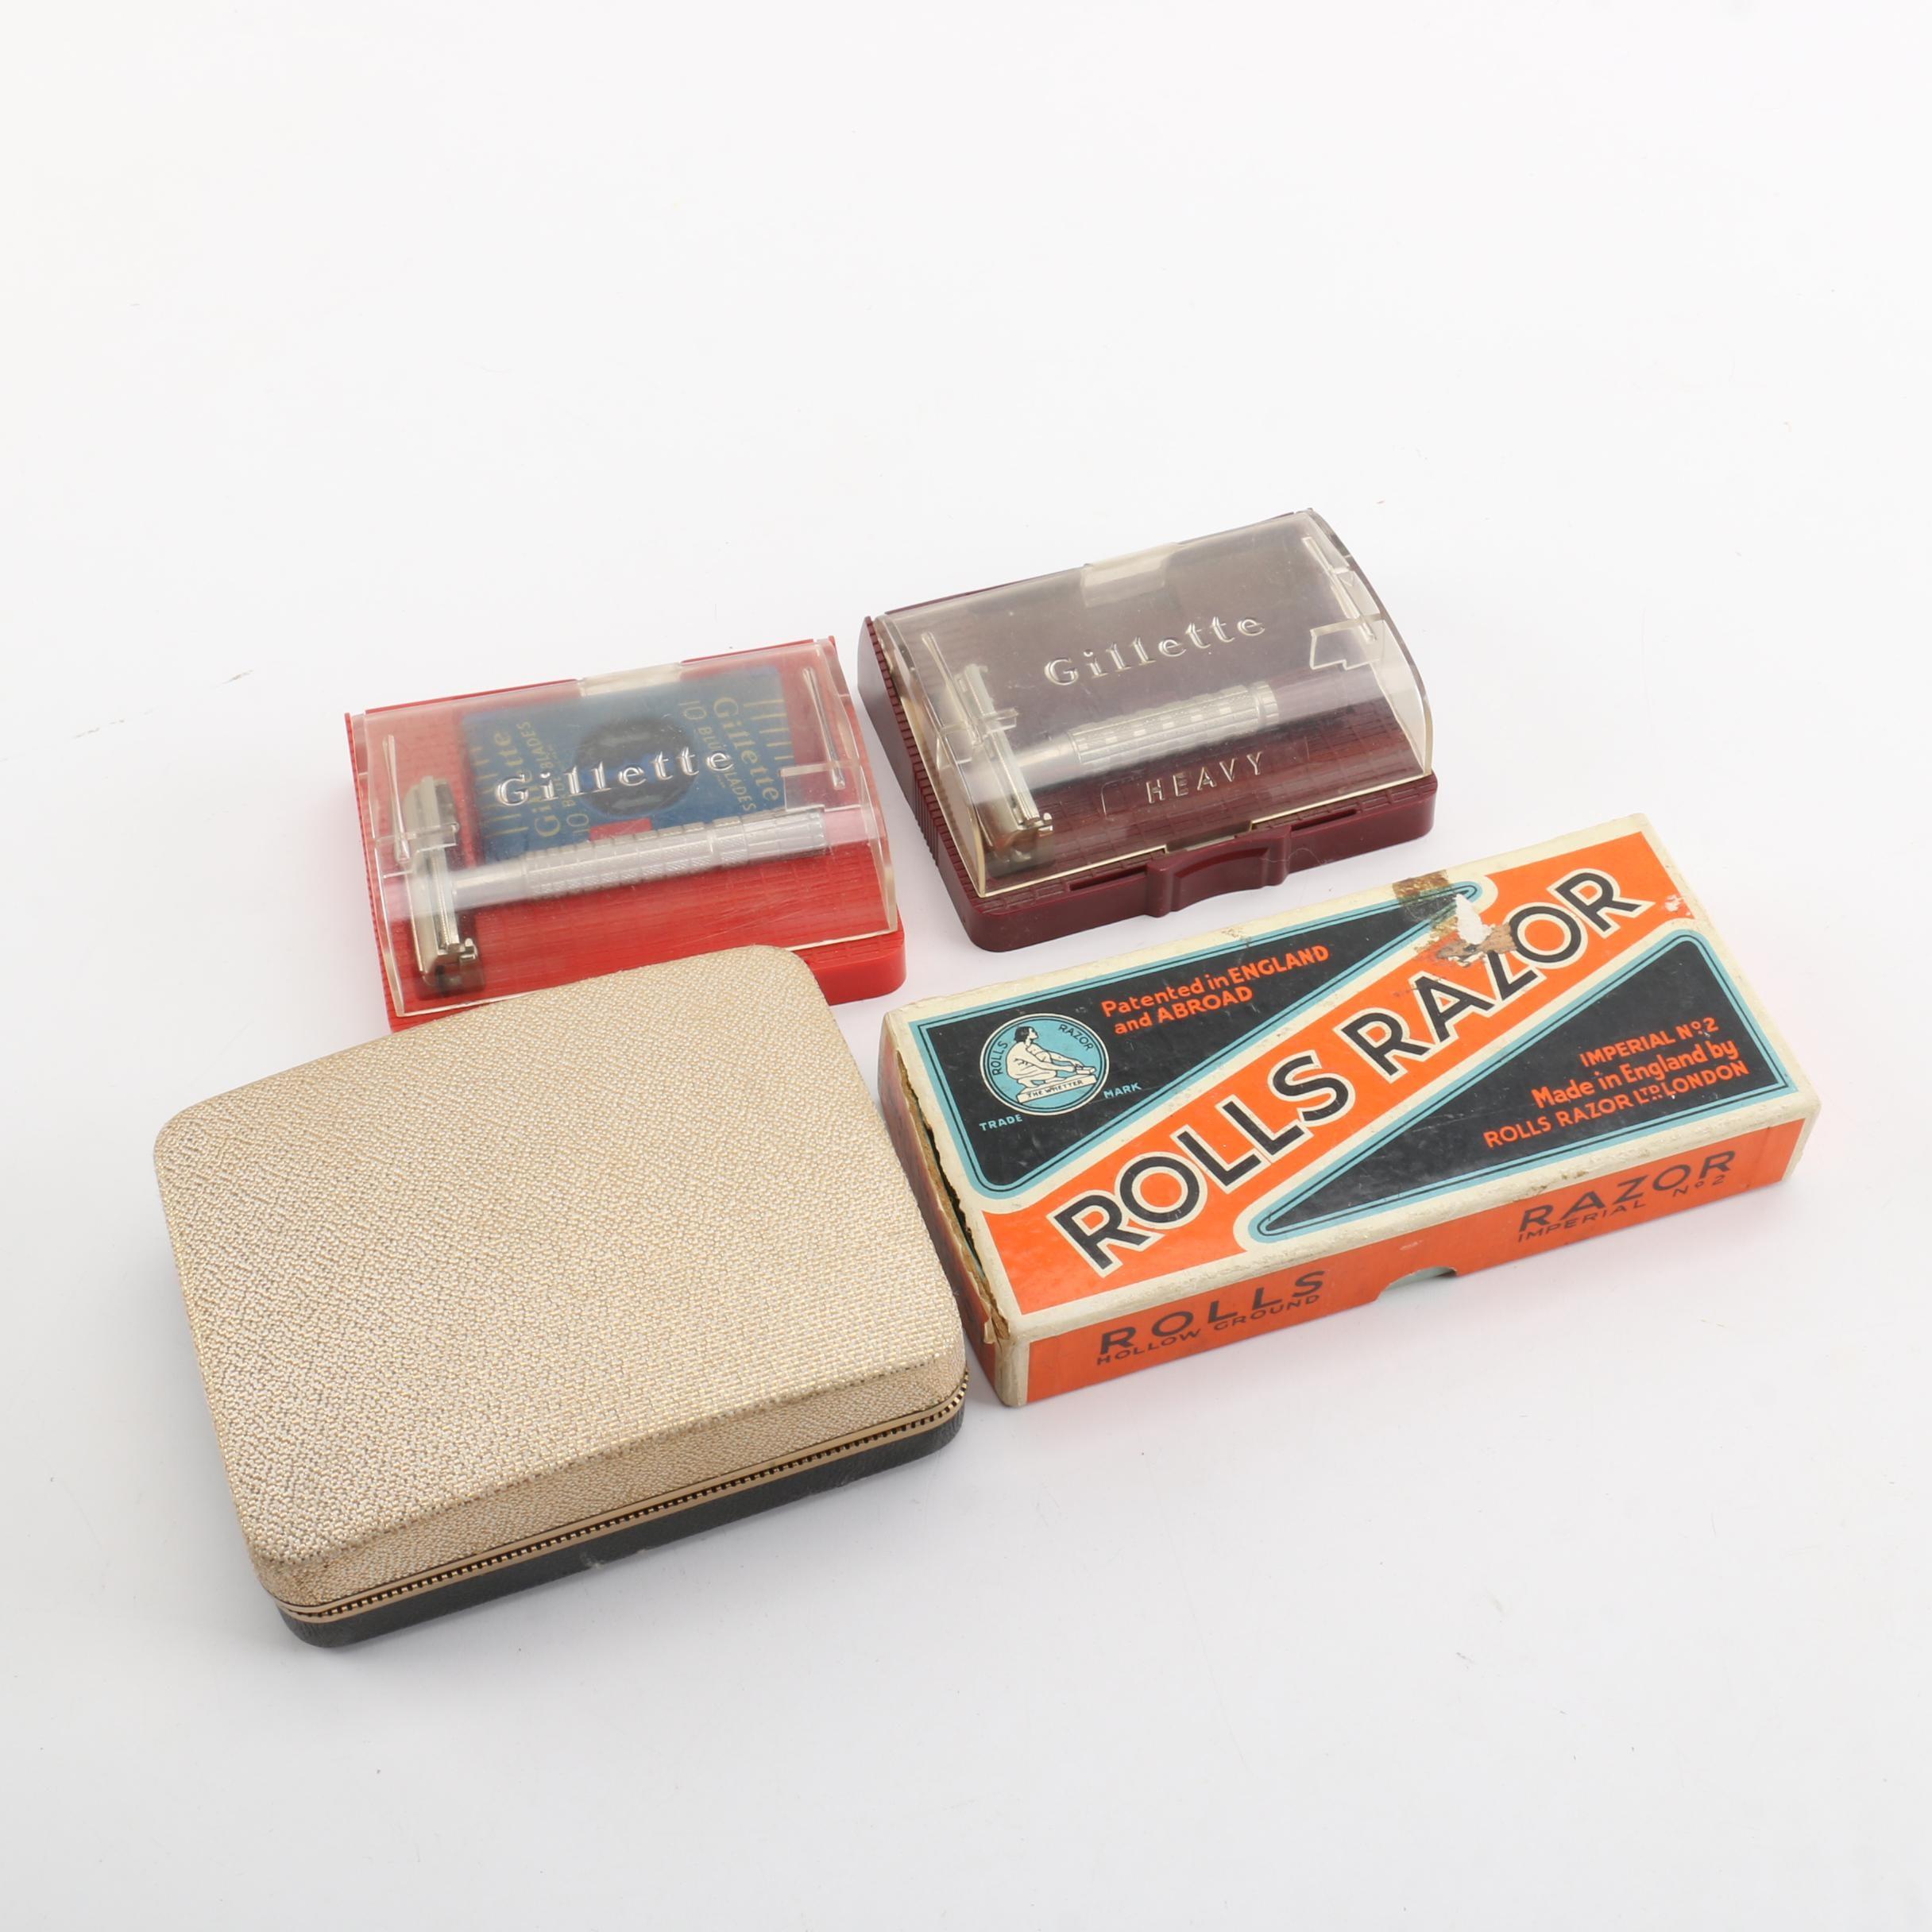 Vintage Razors Including Rolls Razor